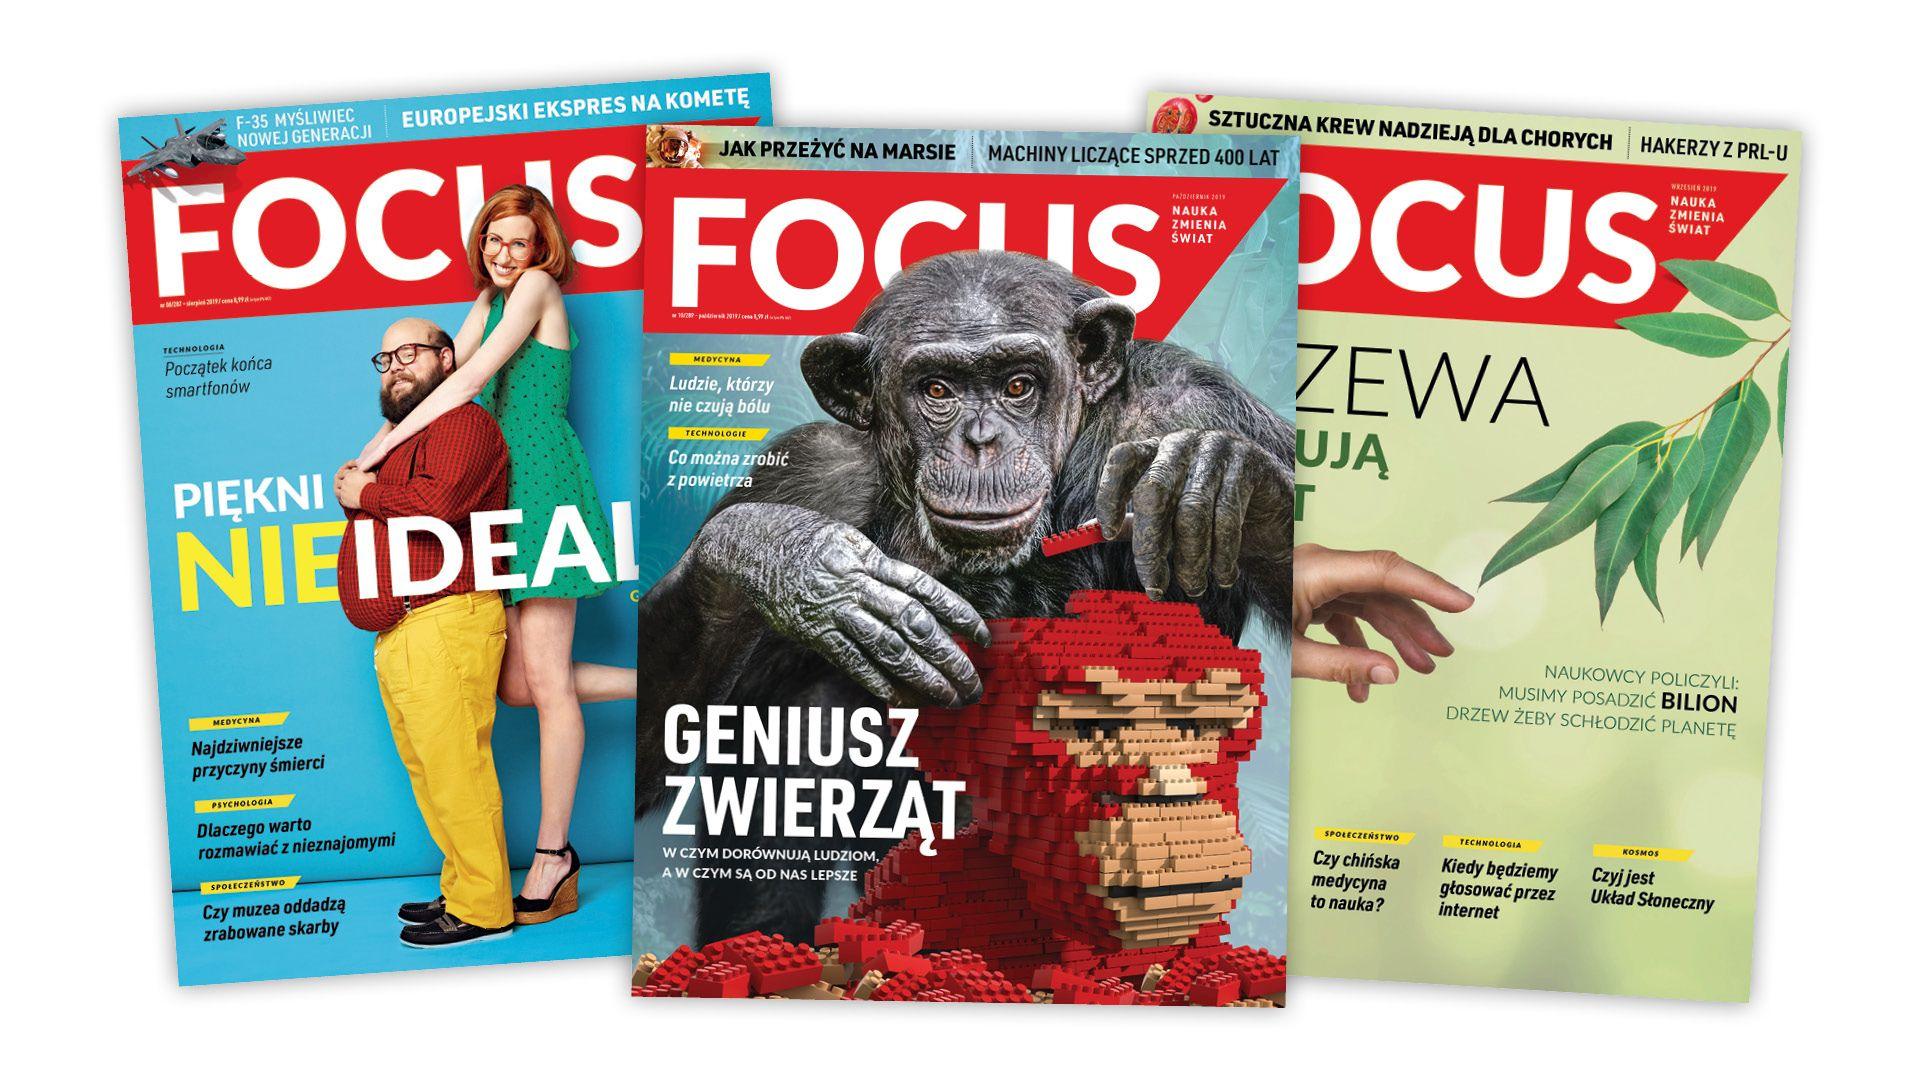 Roczna prenumerata magazynu Focus